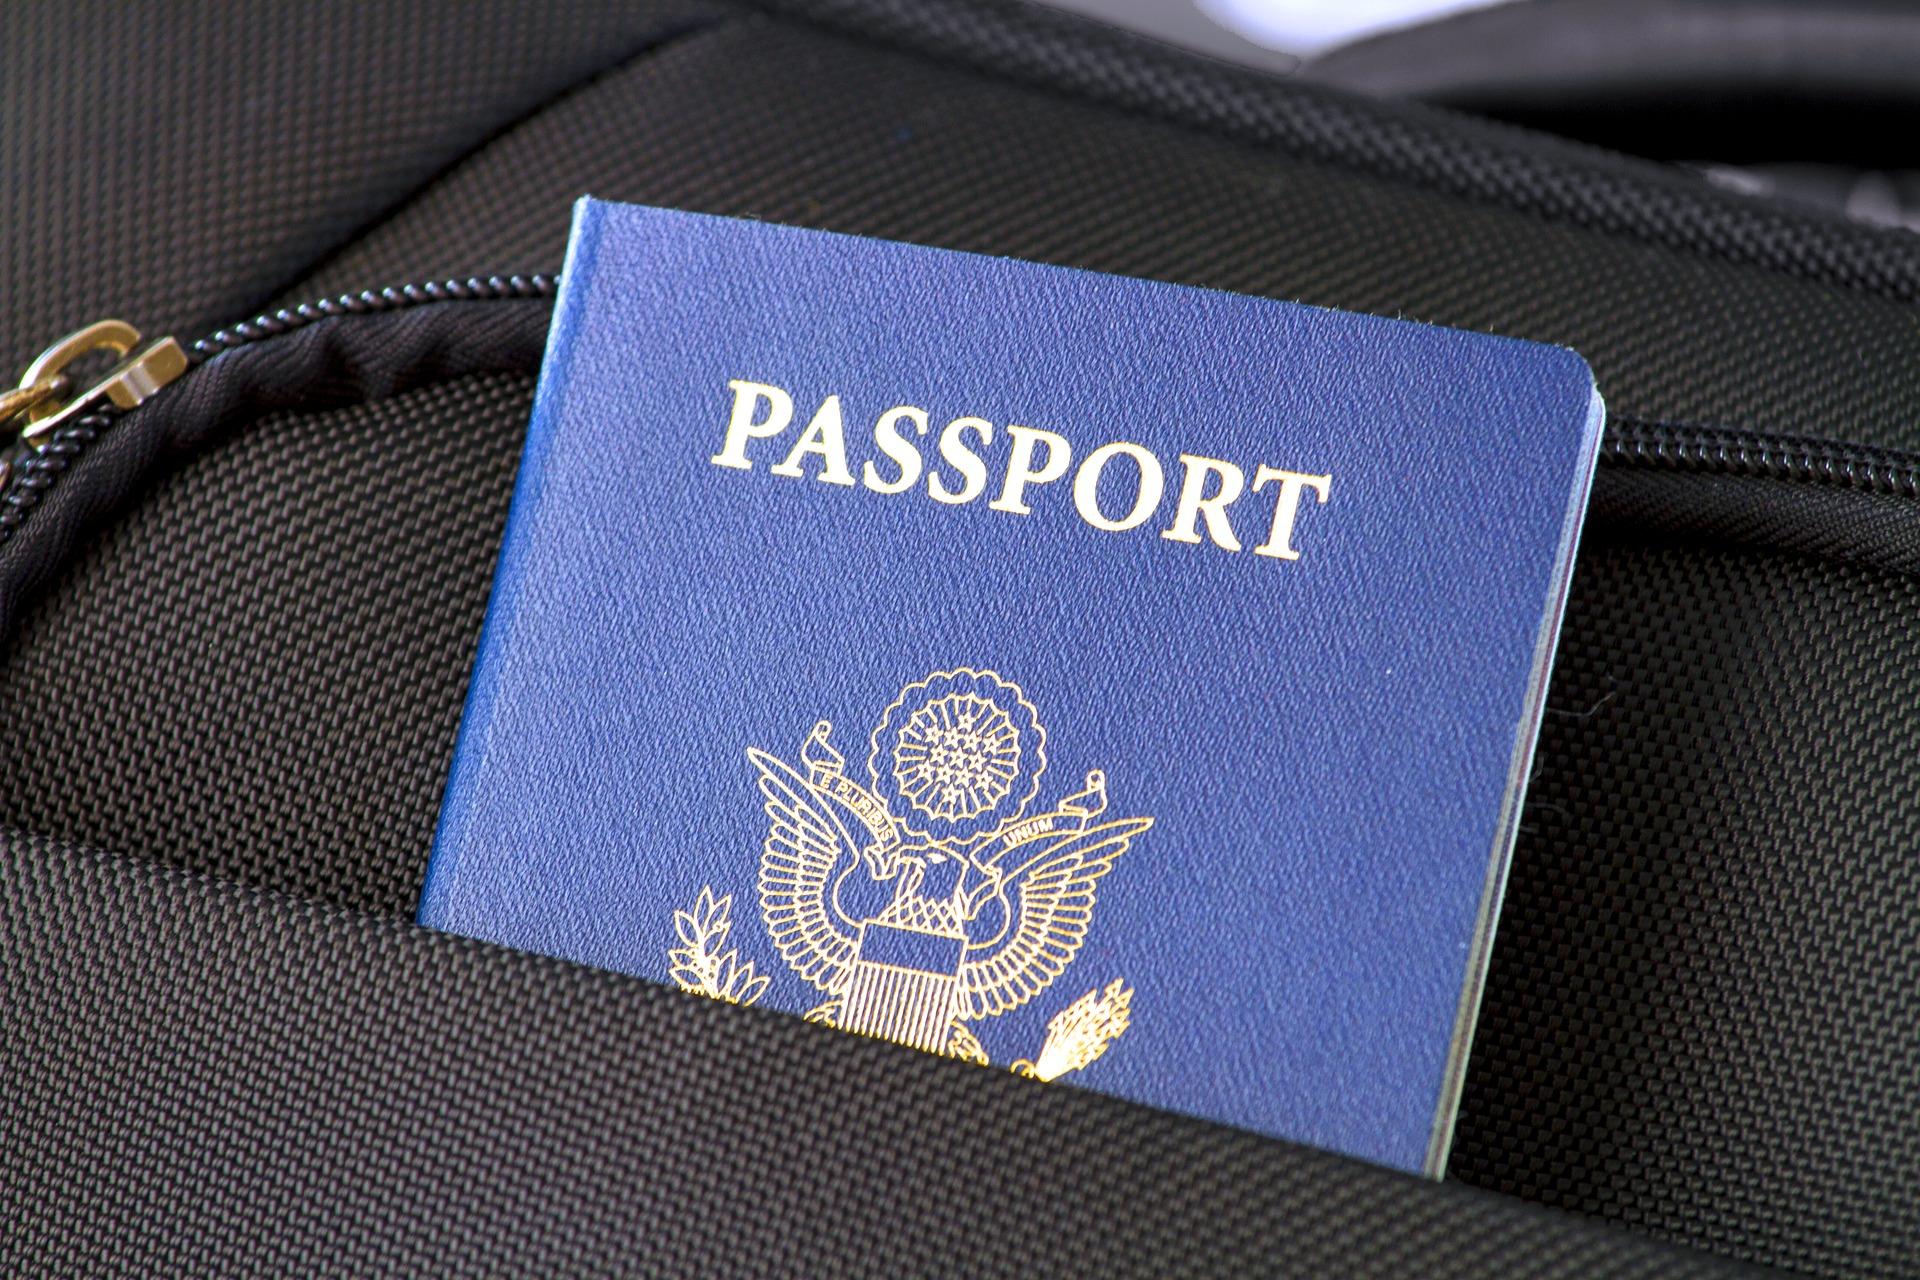 Passaporto per Londra 2020: